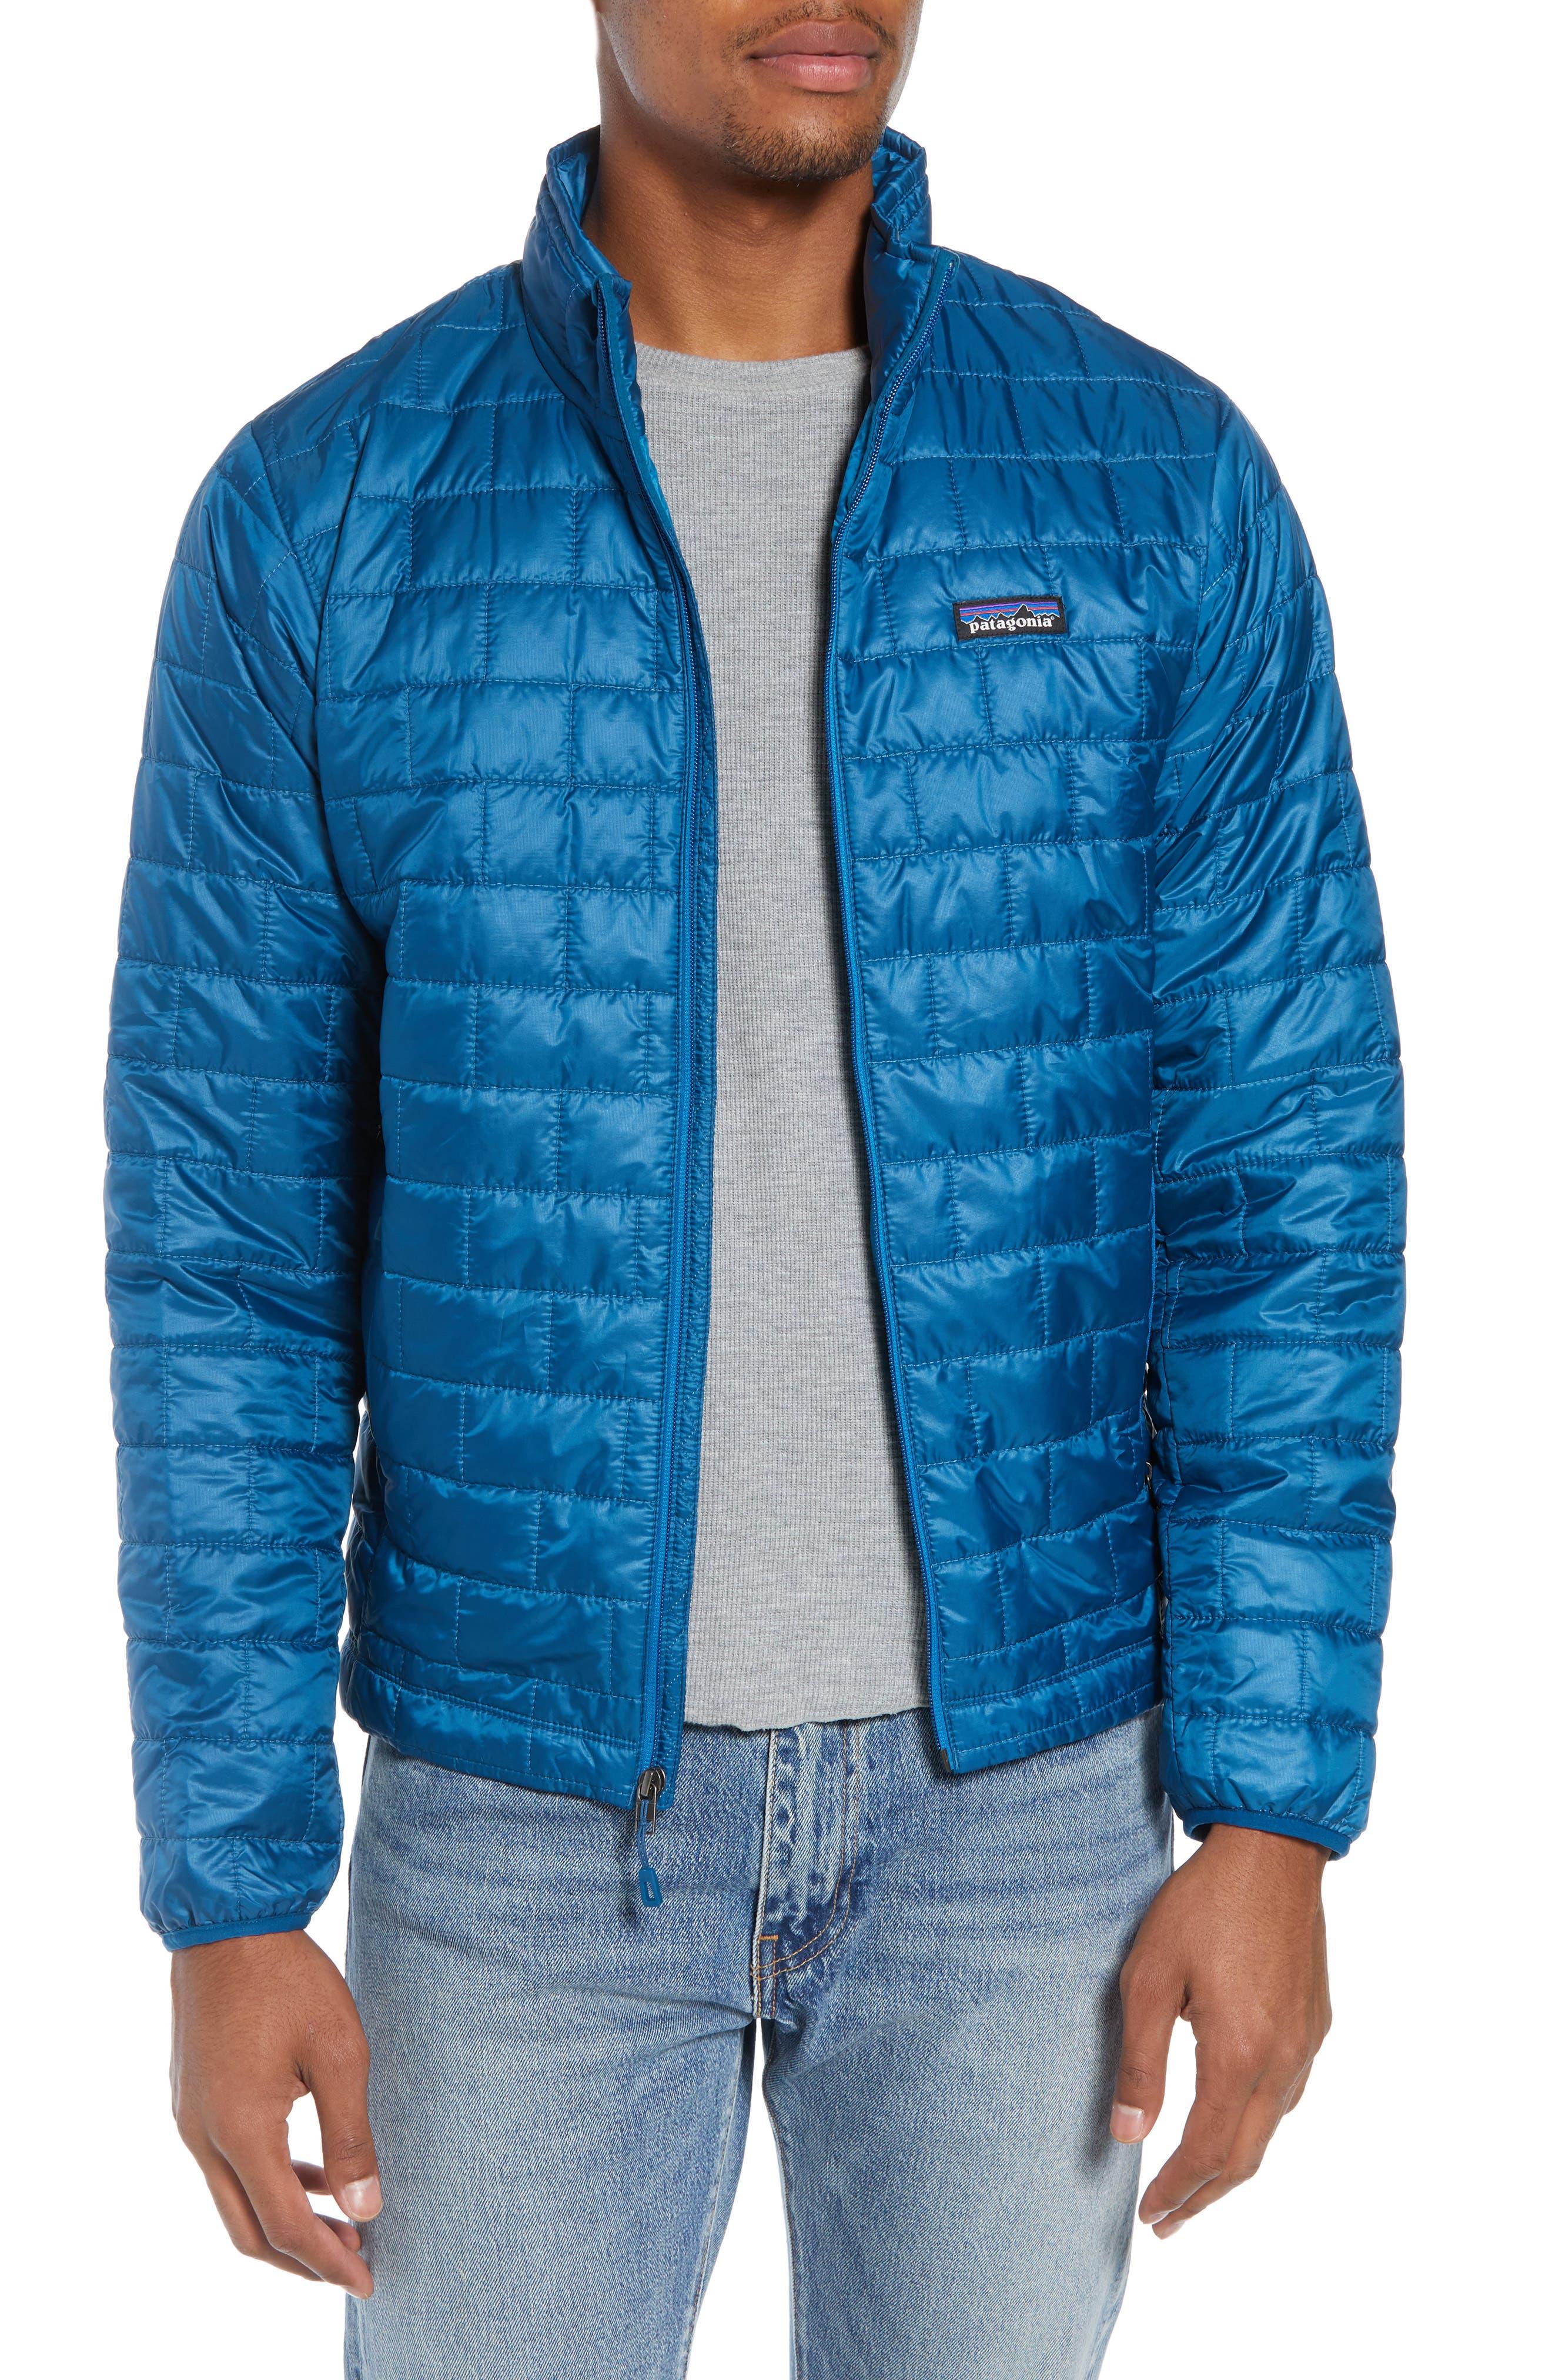 PATAGONIA, 'Nano Puff<sup>®</sup>' Water Resistant Jacket, Main thumbnail 1, color, BIG SUR BLUE W/ BALKAN BLUE